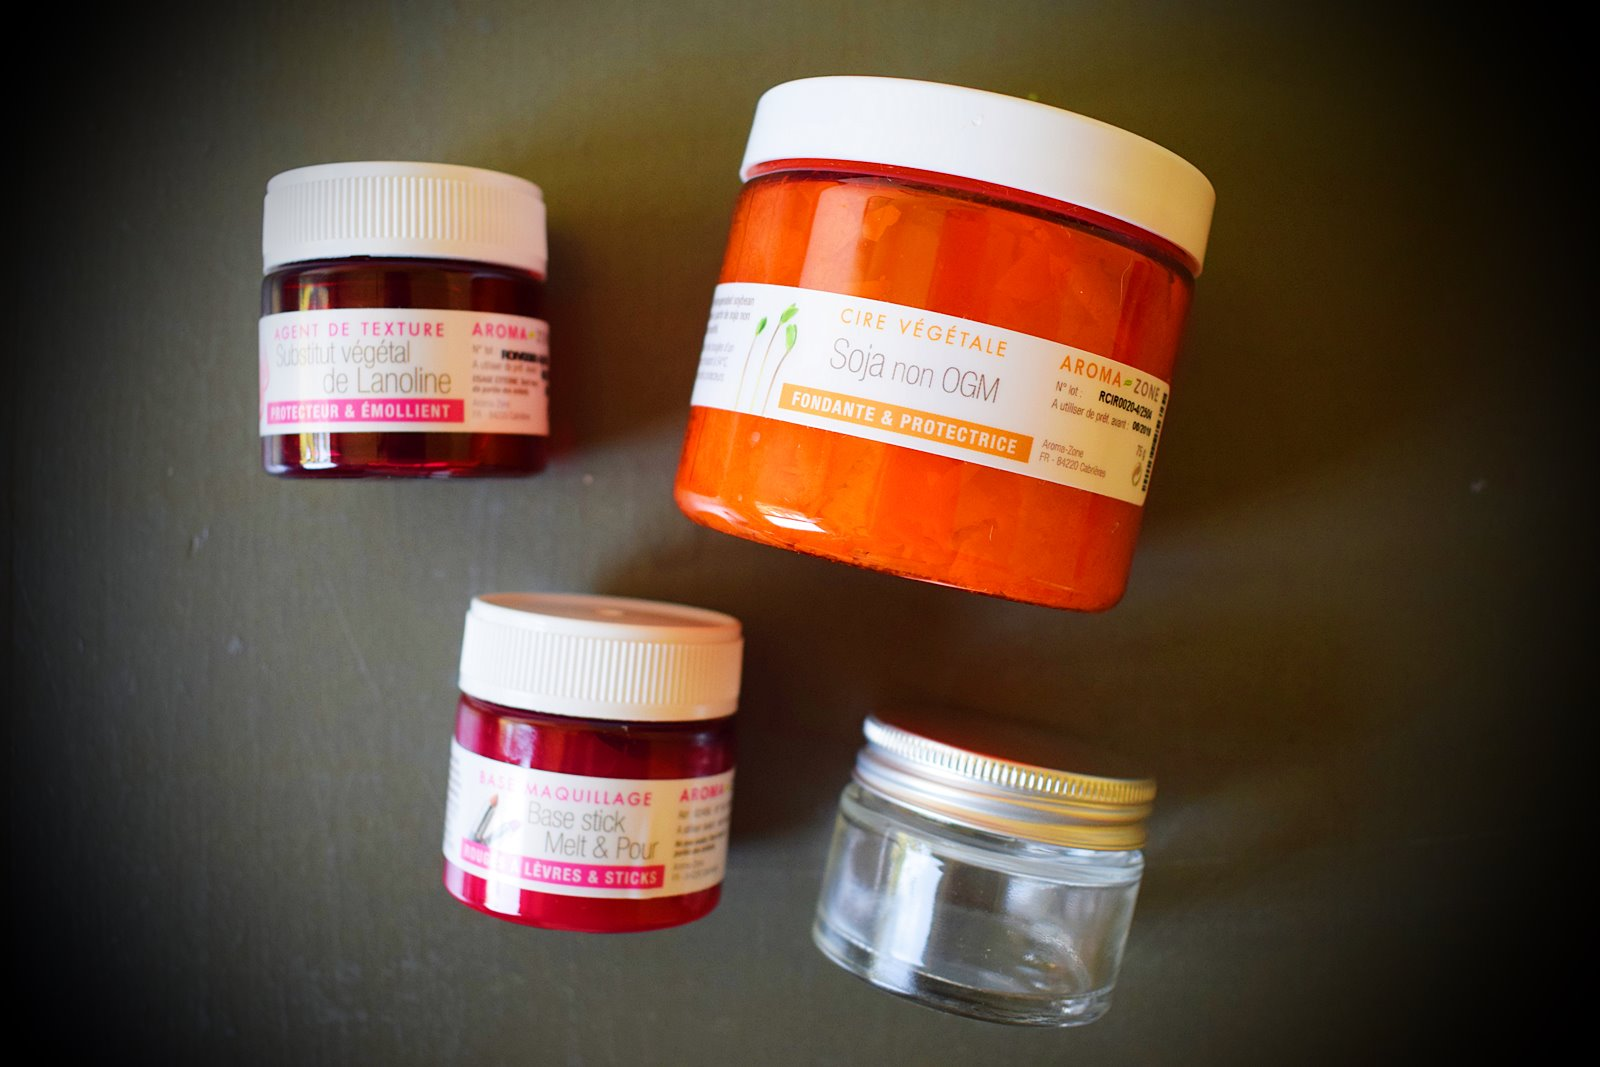 Cosmetiques barbes maison naturel commande aroma zone blog avis 1